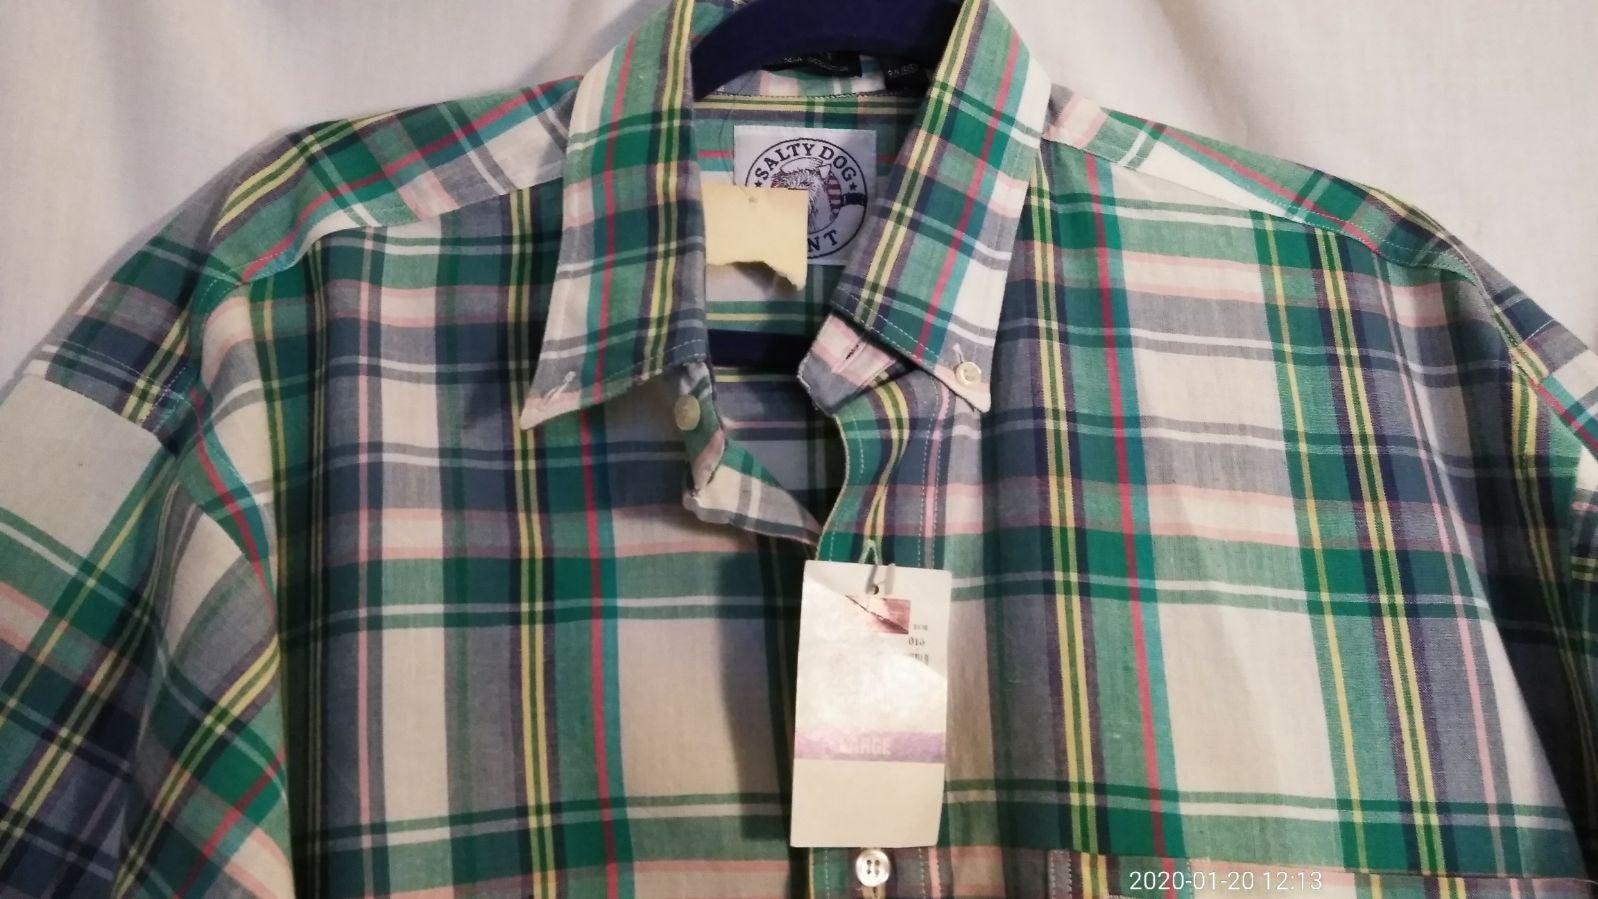 New! Gant Salty Dog long sleeve shirt